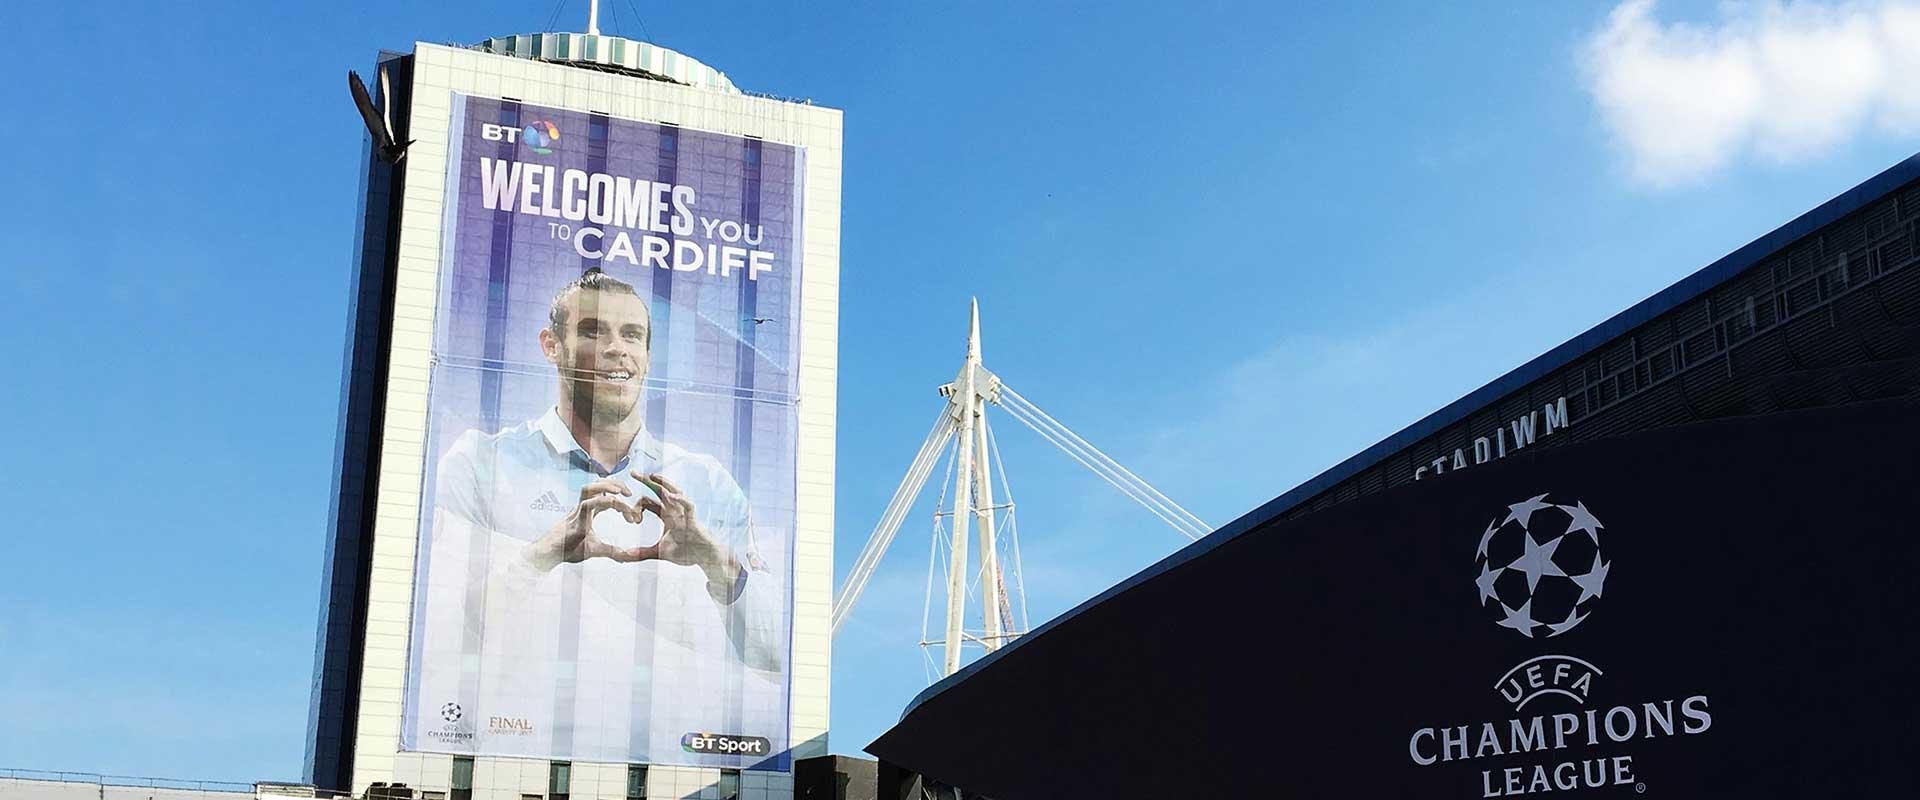 Champions League final Cardiff BT building banner featuring Gareth Bale